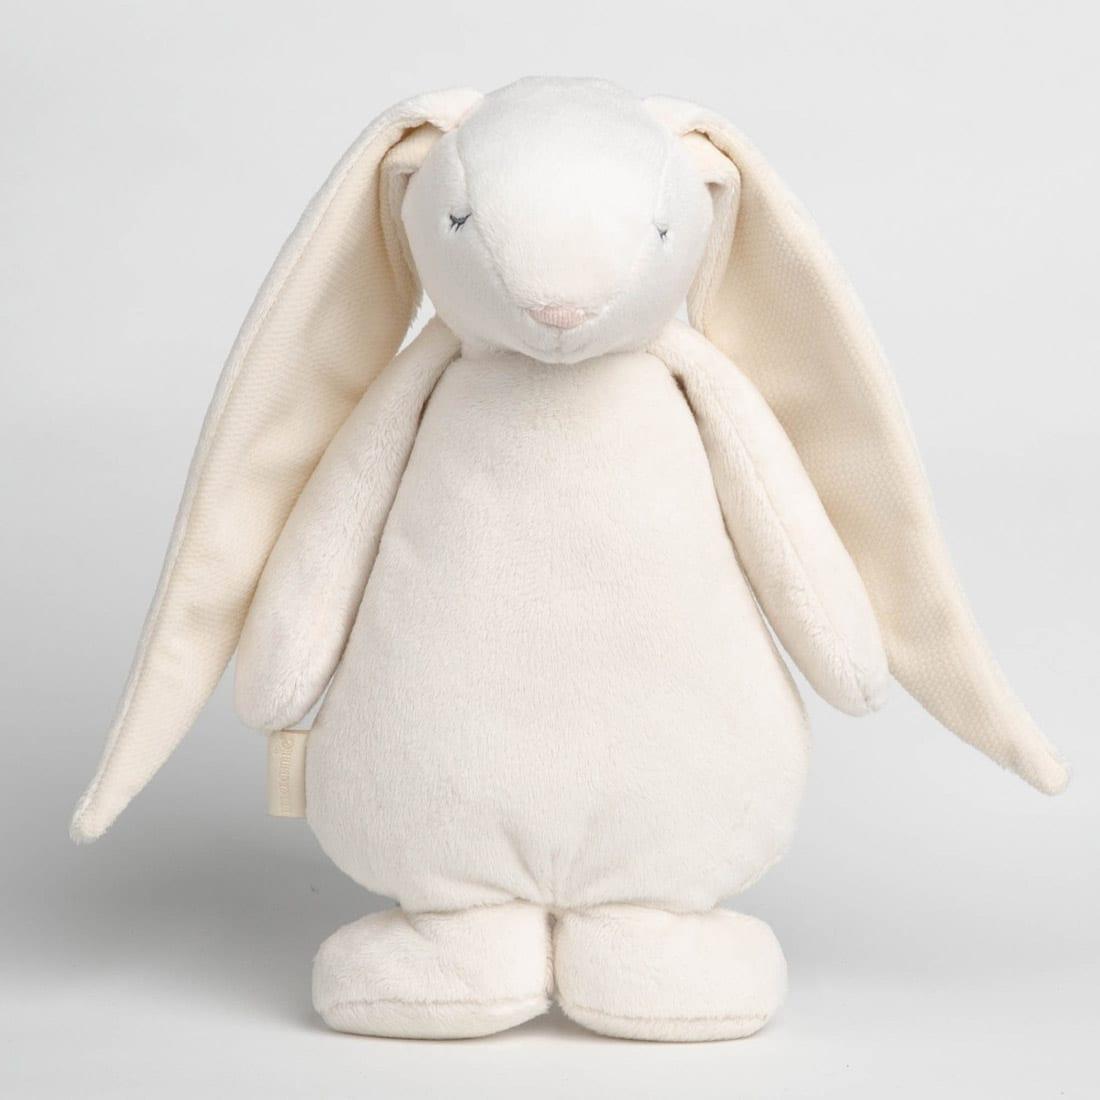 Moonie Humming Friend Baby Nightlight Cream